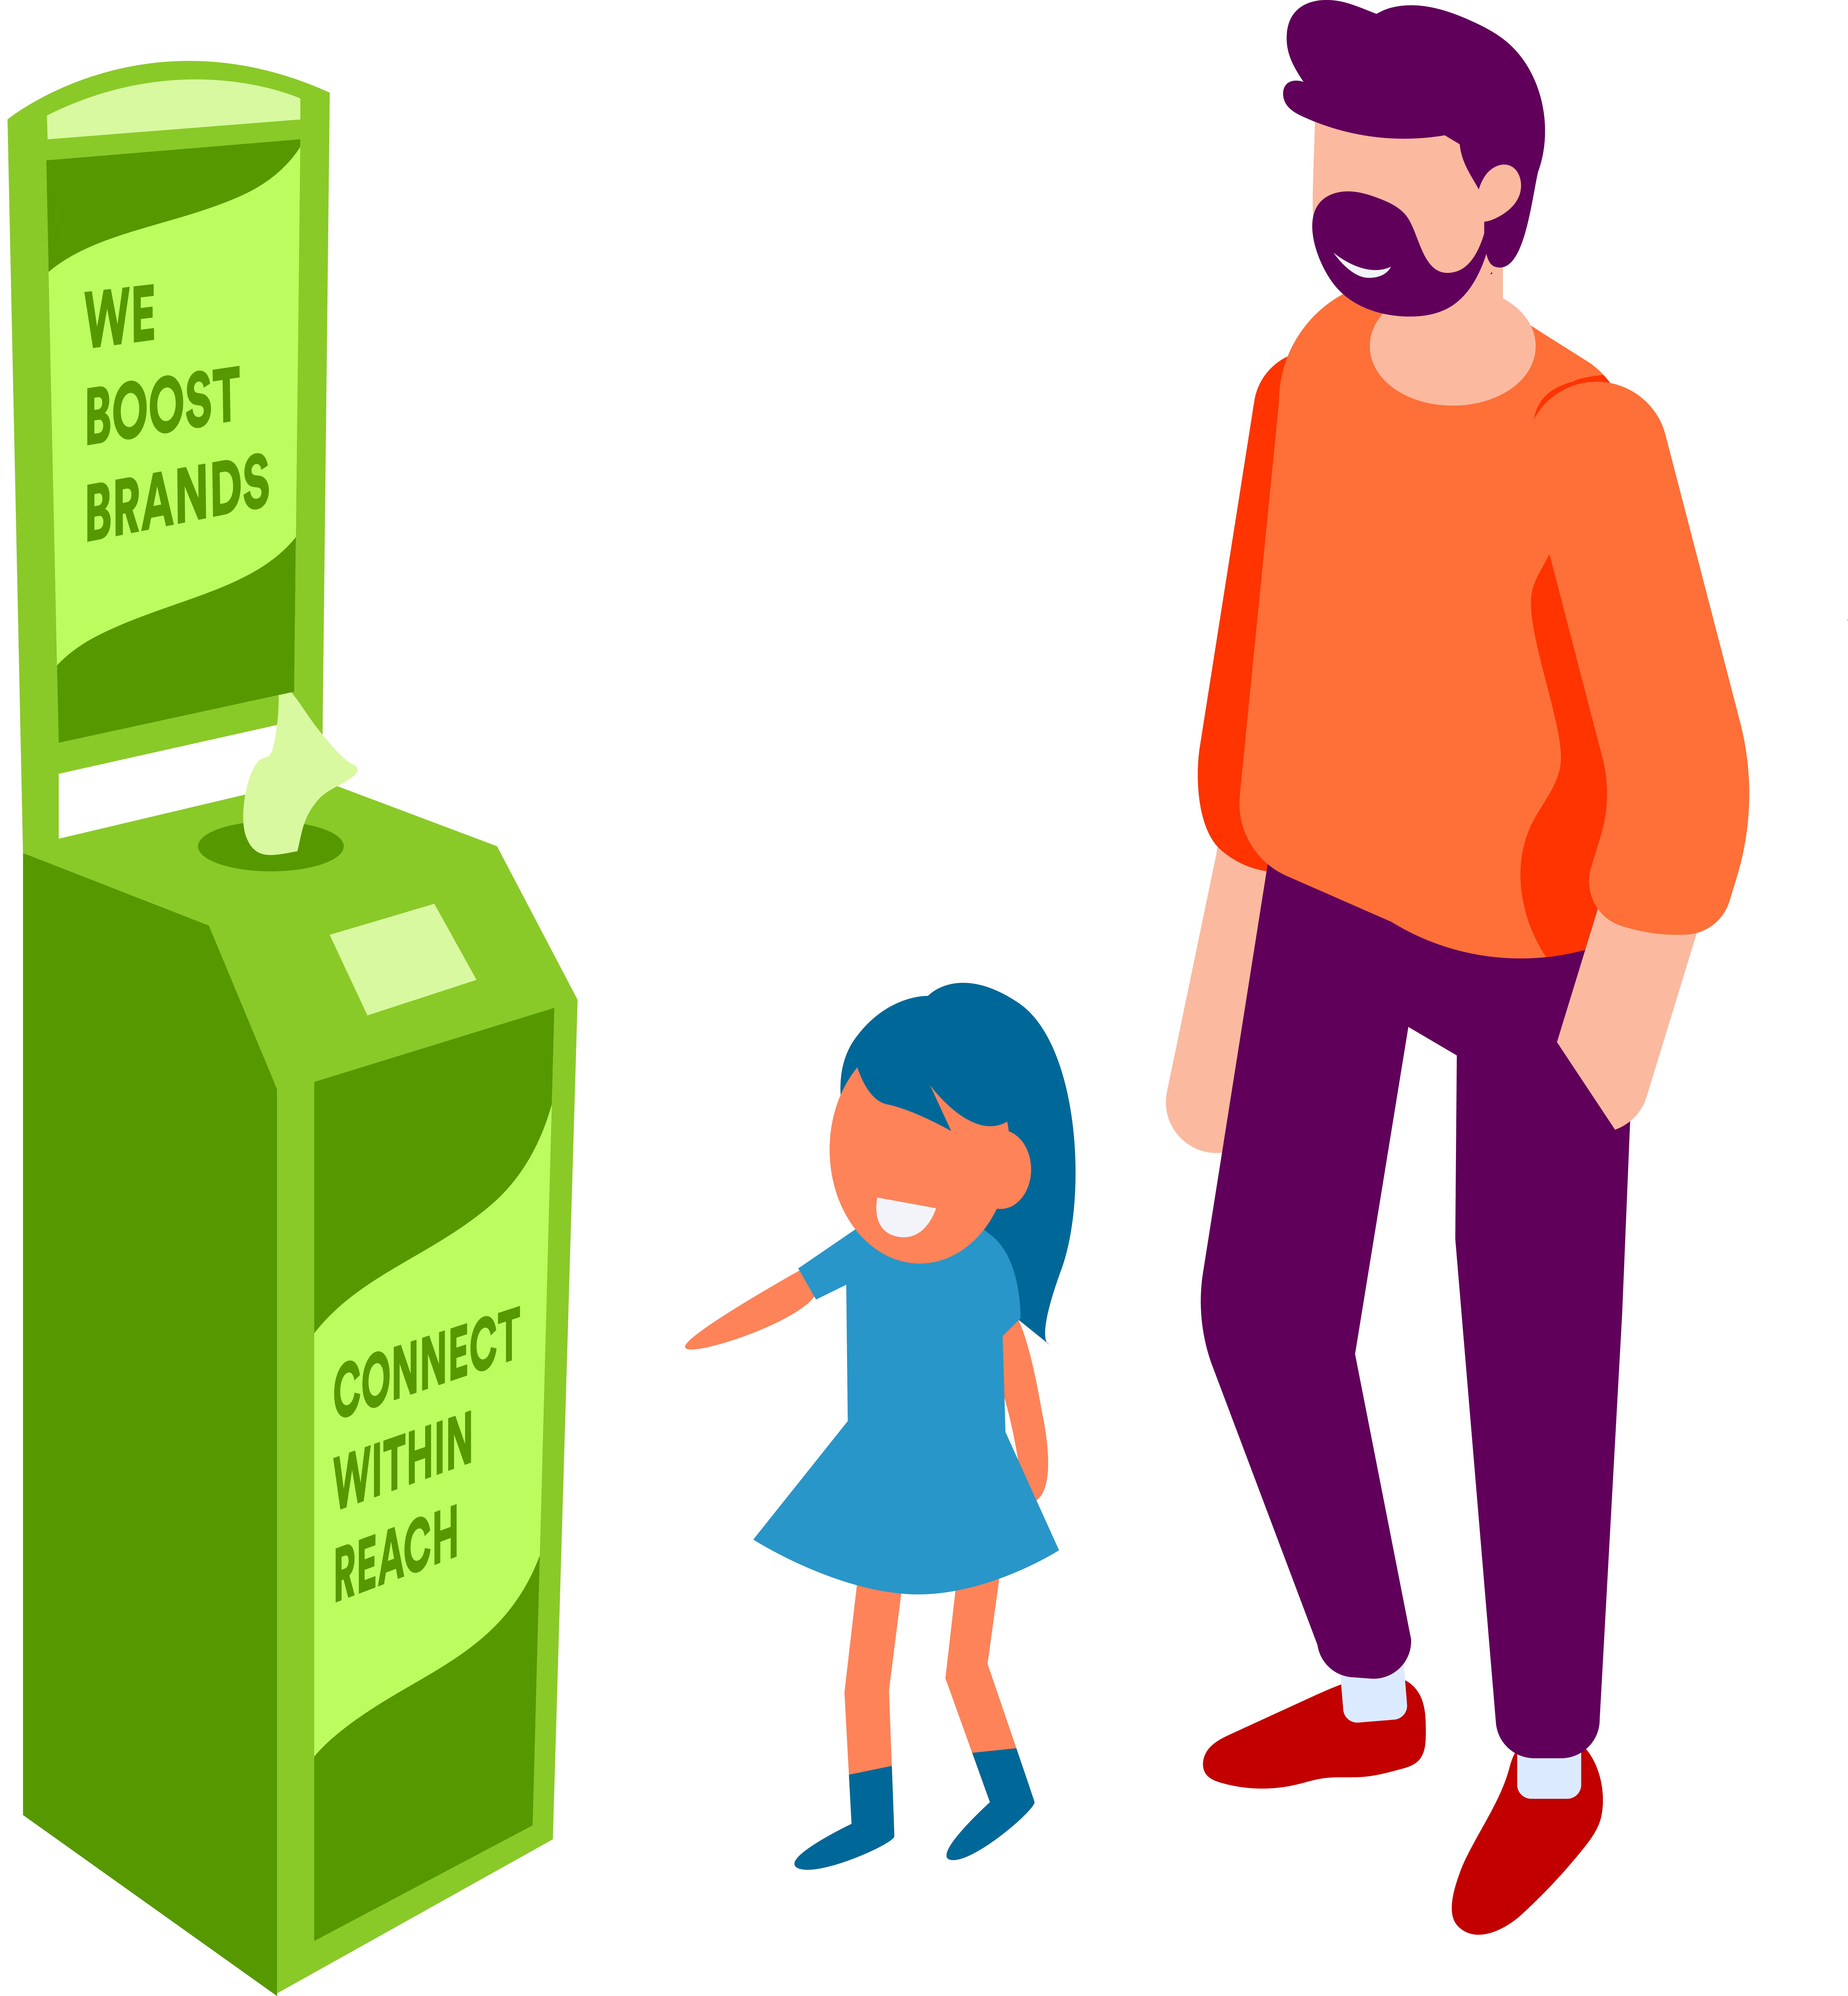 Family using national advertisement wellness billboard